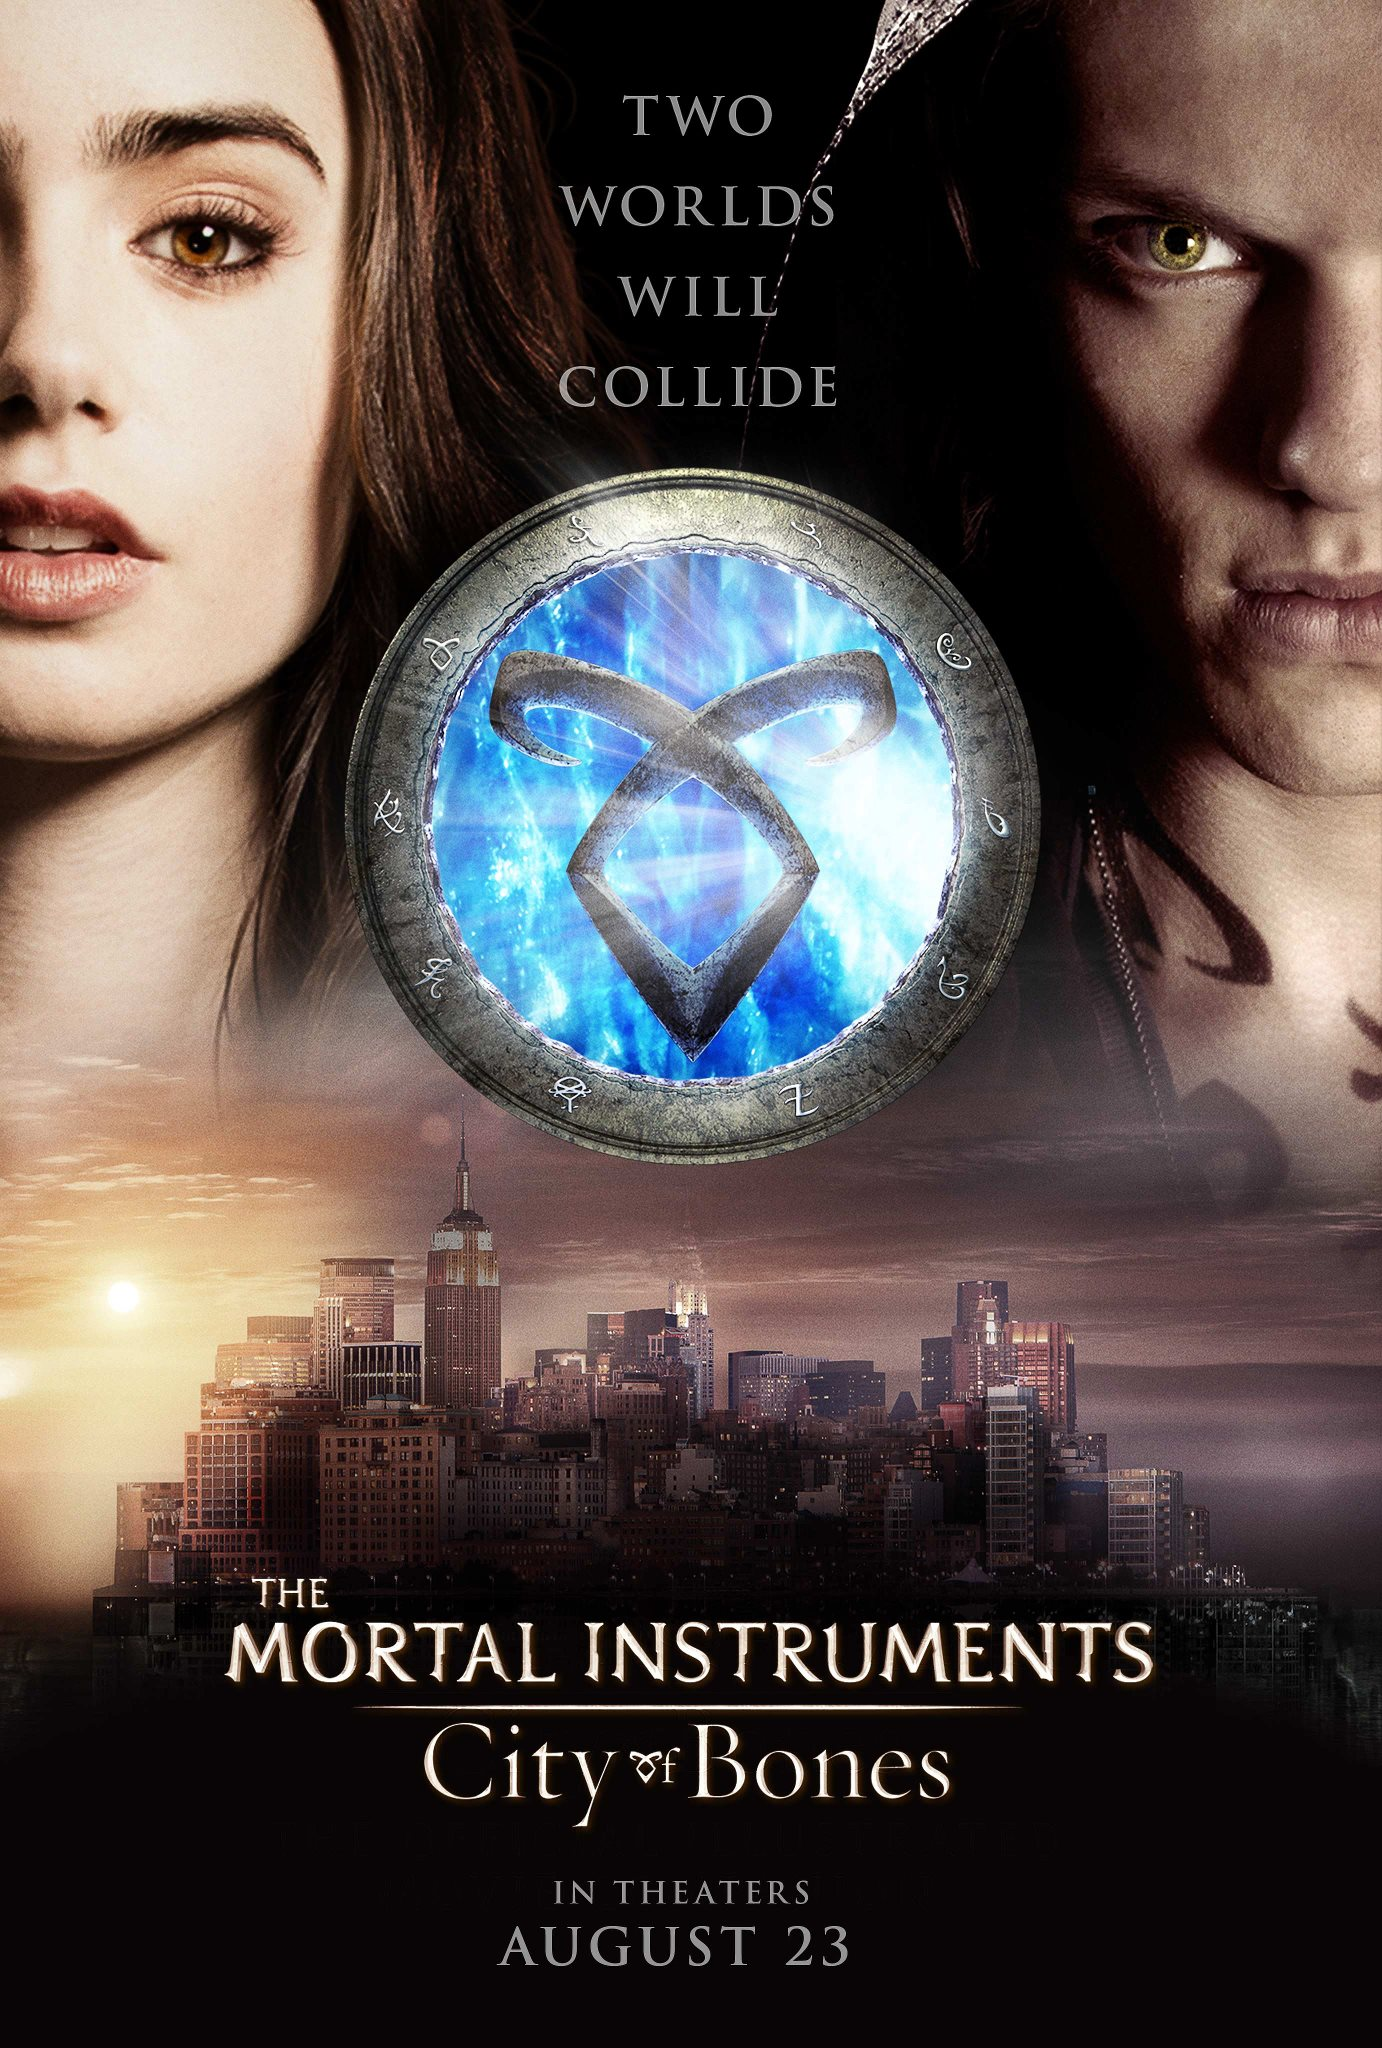 The Mortal Instruments City of Bones Movie